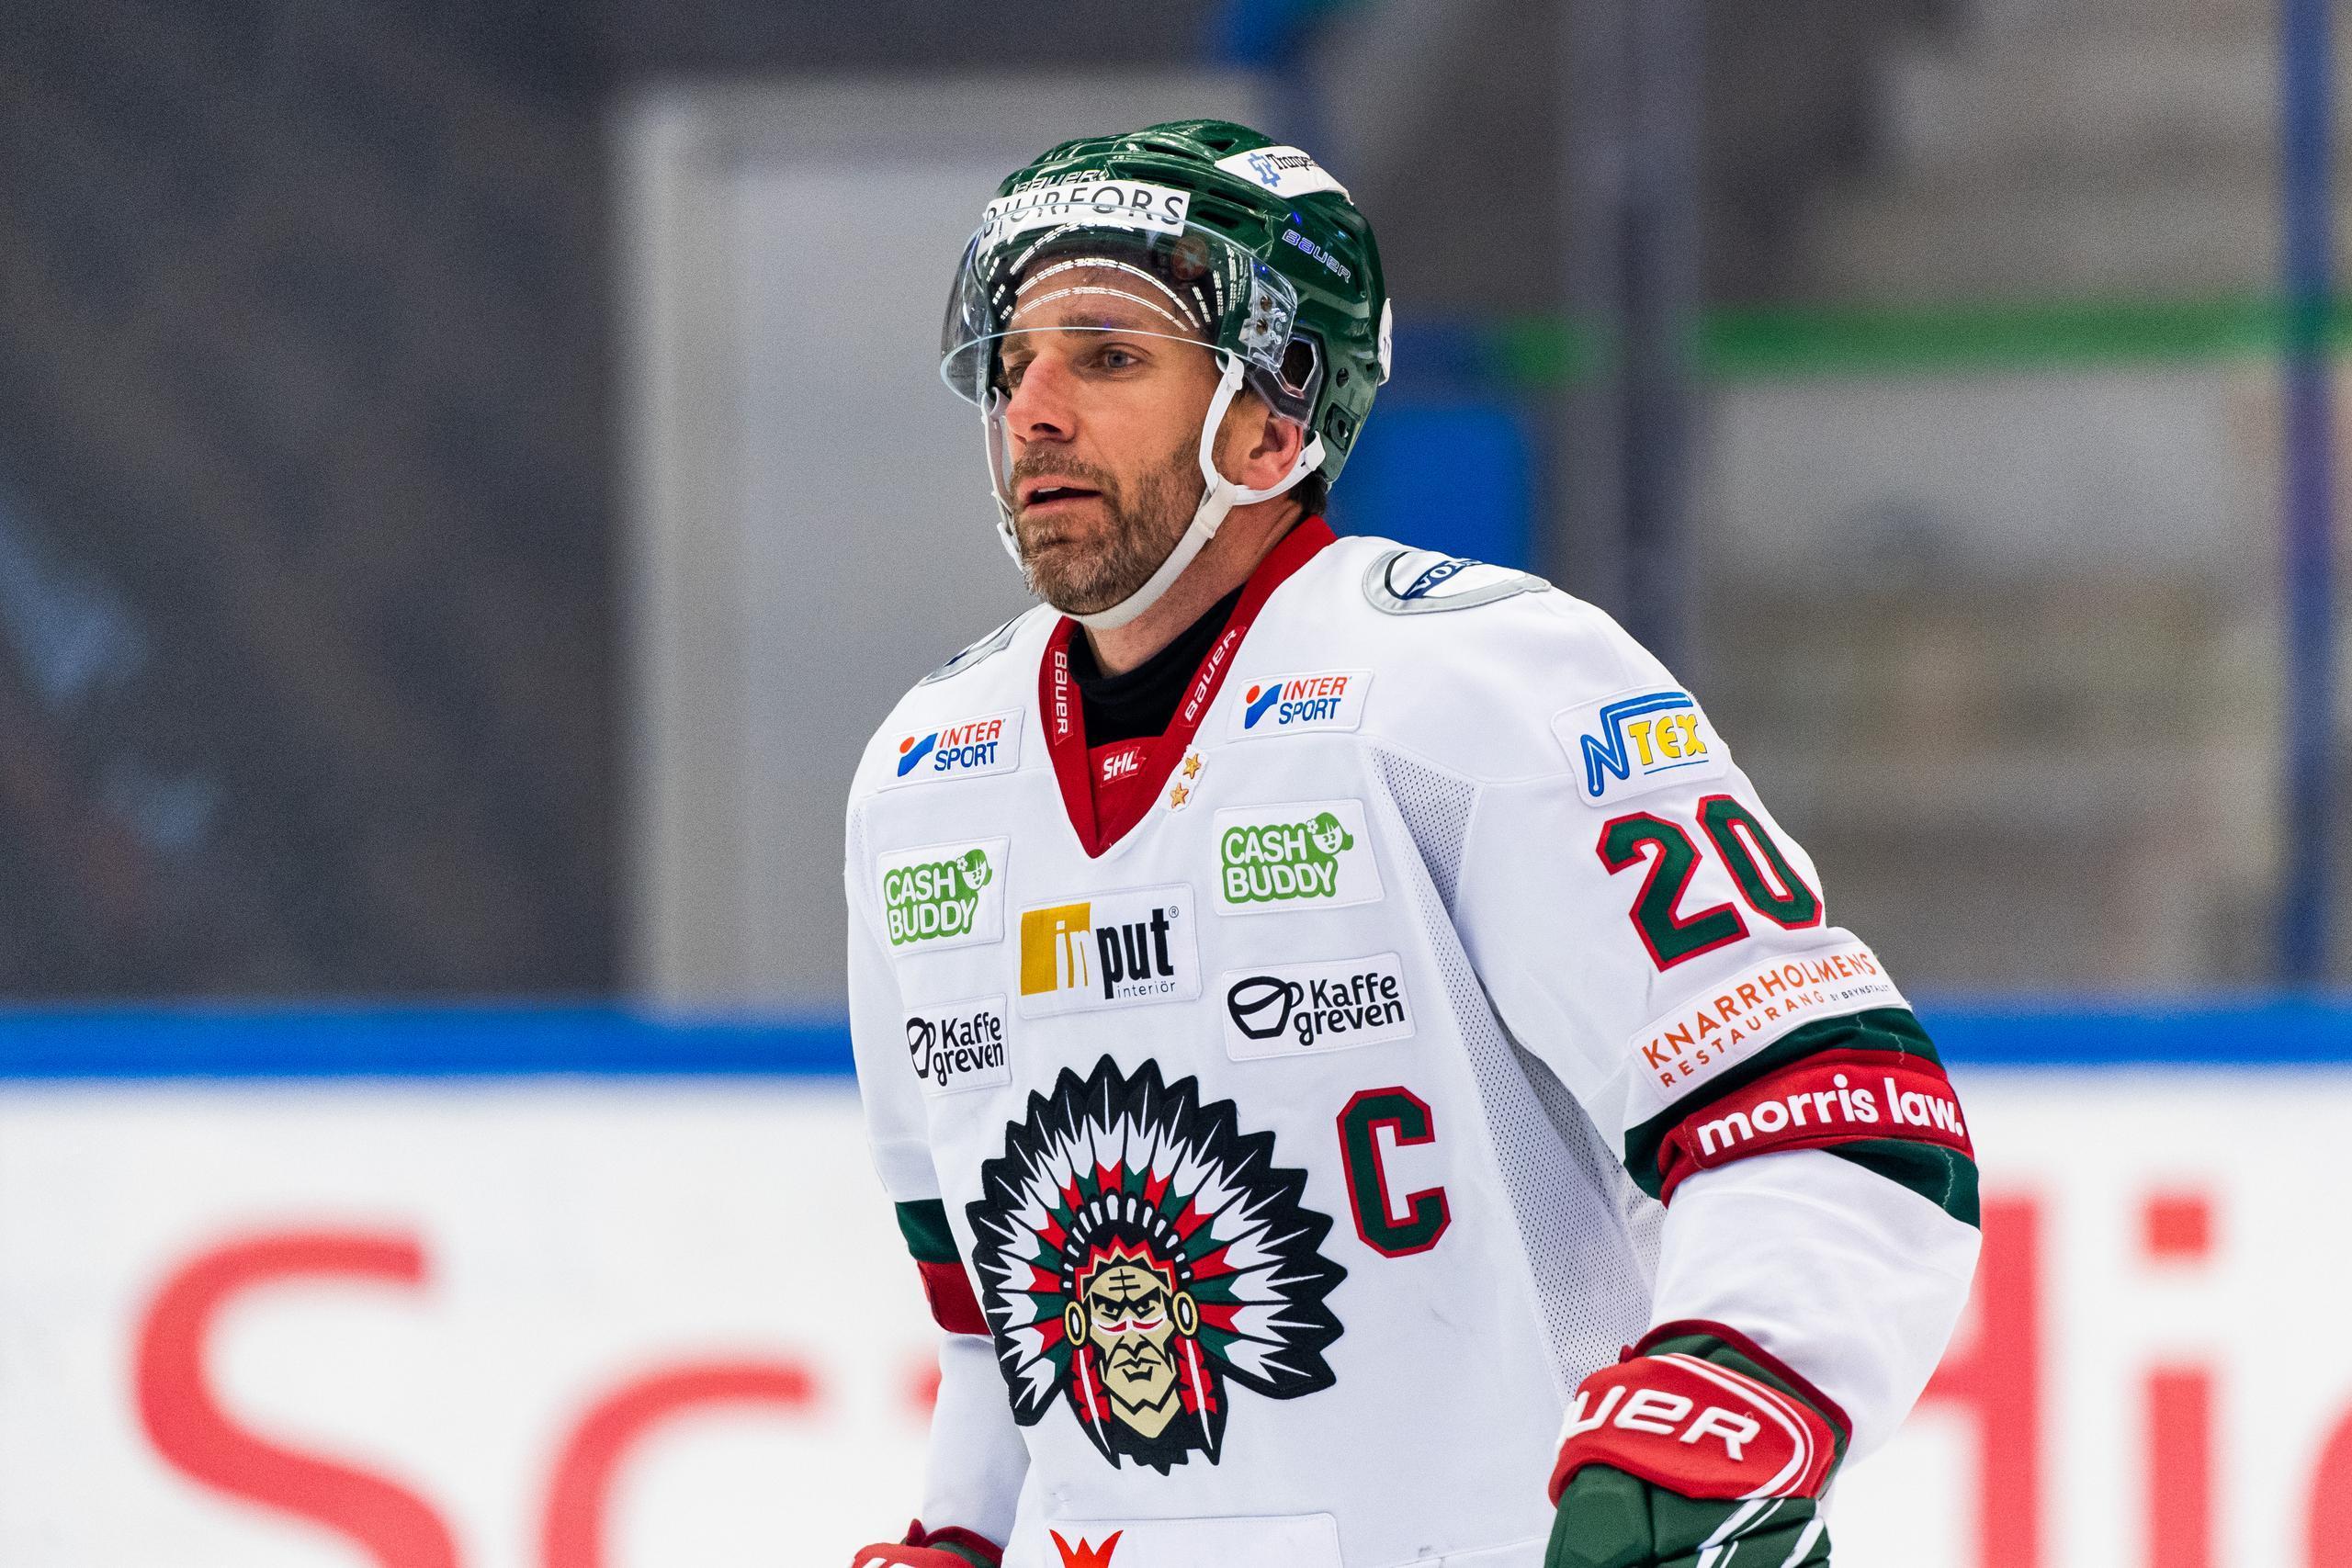 Joel Lundqvists utmaning efter mardrömsresultaten